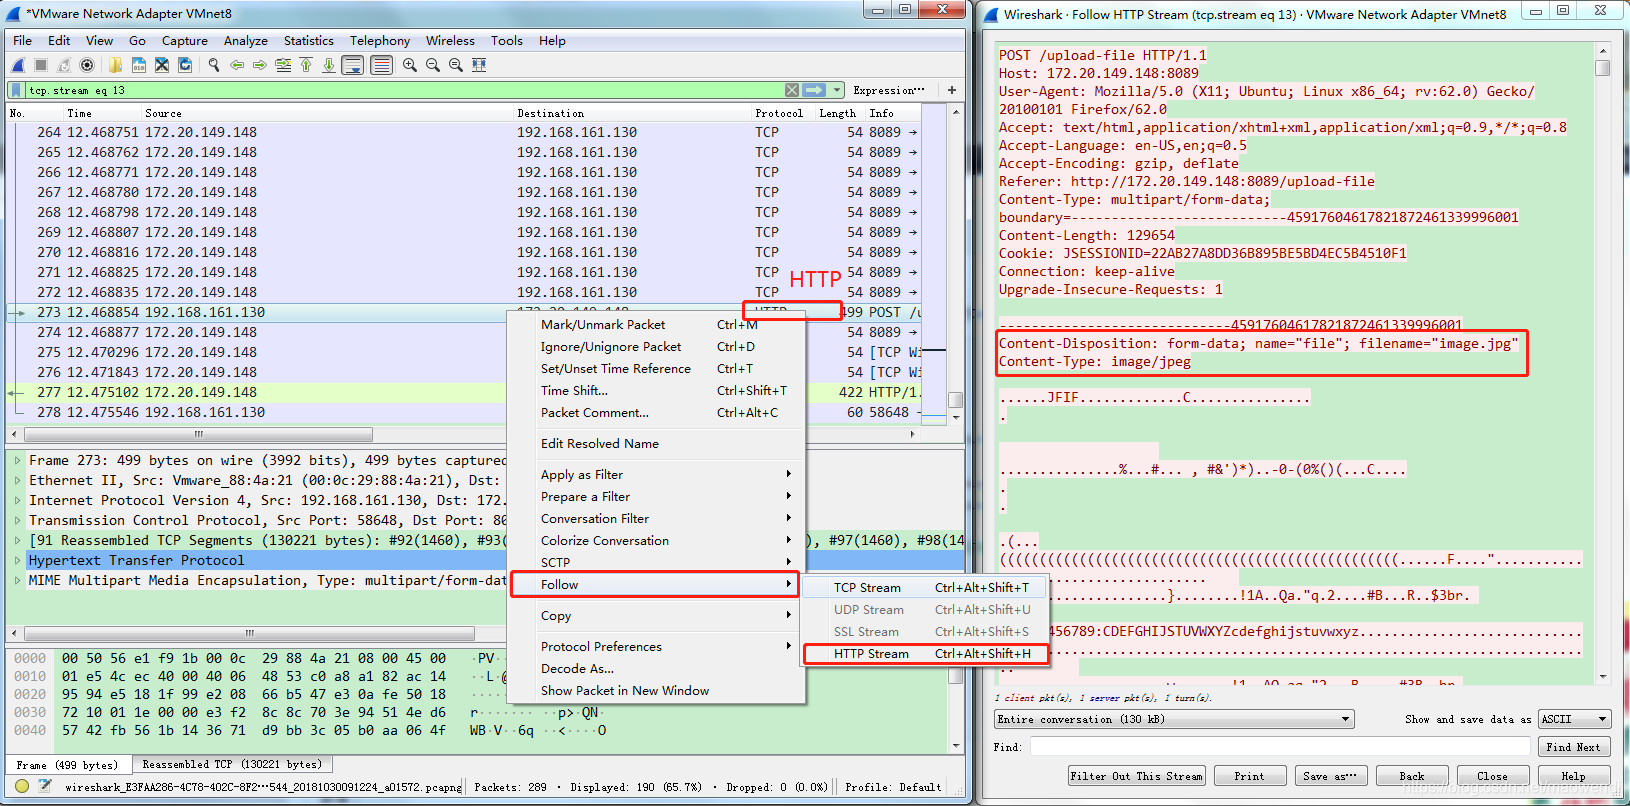 Qt Http QHttpMultiPart上传文件到java http服务器- maowendi的专栏